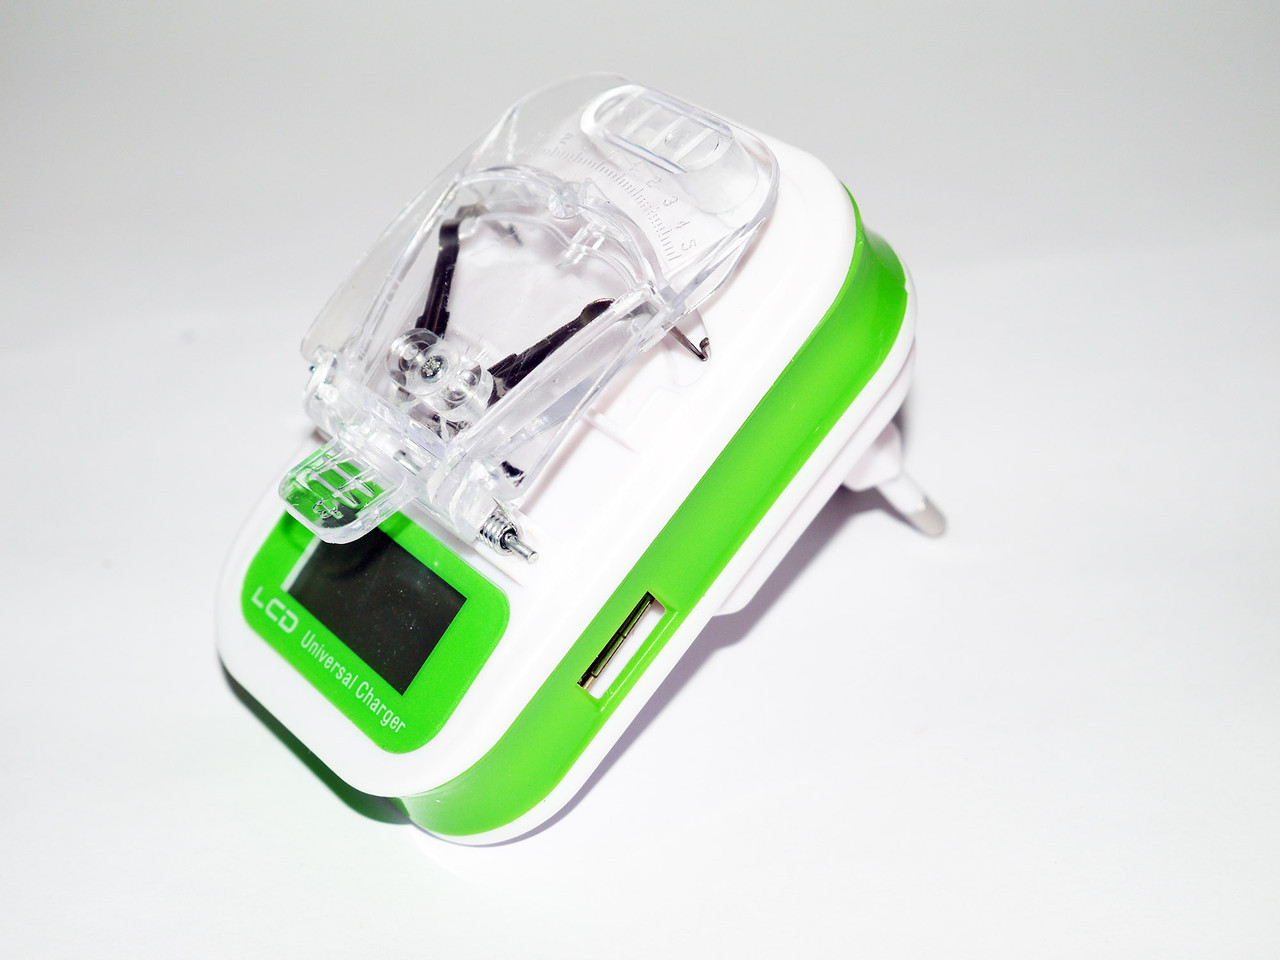 Адаптер HY02 LCD Жабка, зарядное устройство, сетевой адаптер, зарядное устройство адаптер питания